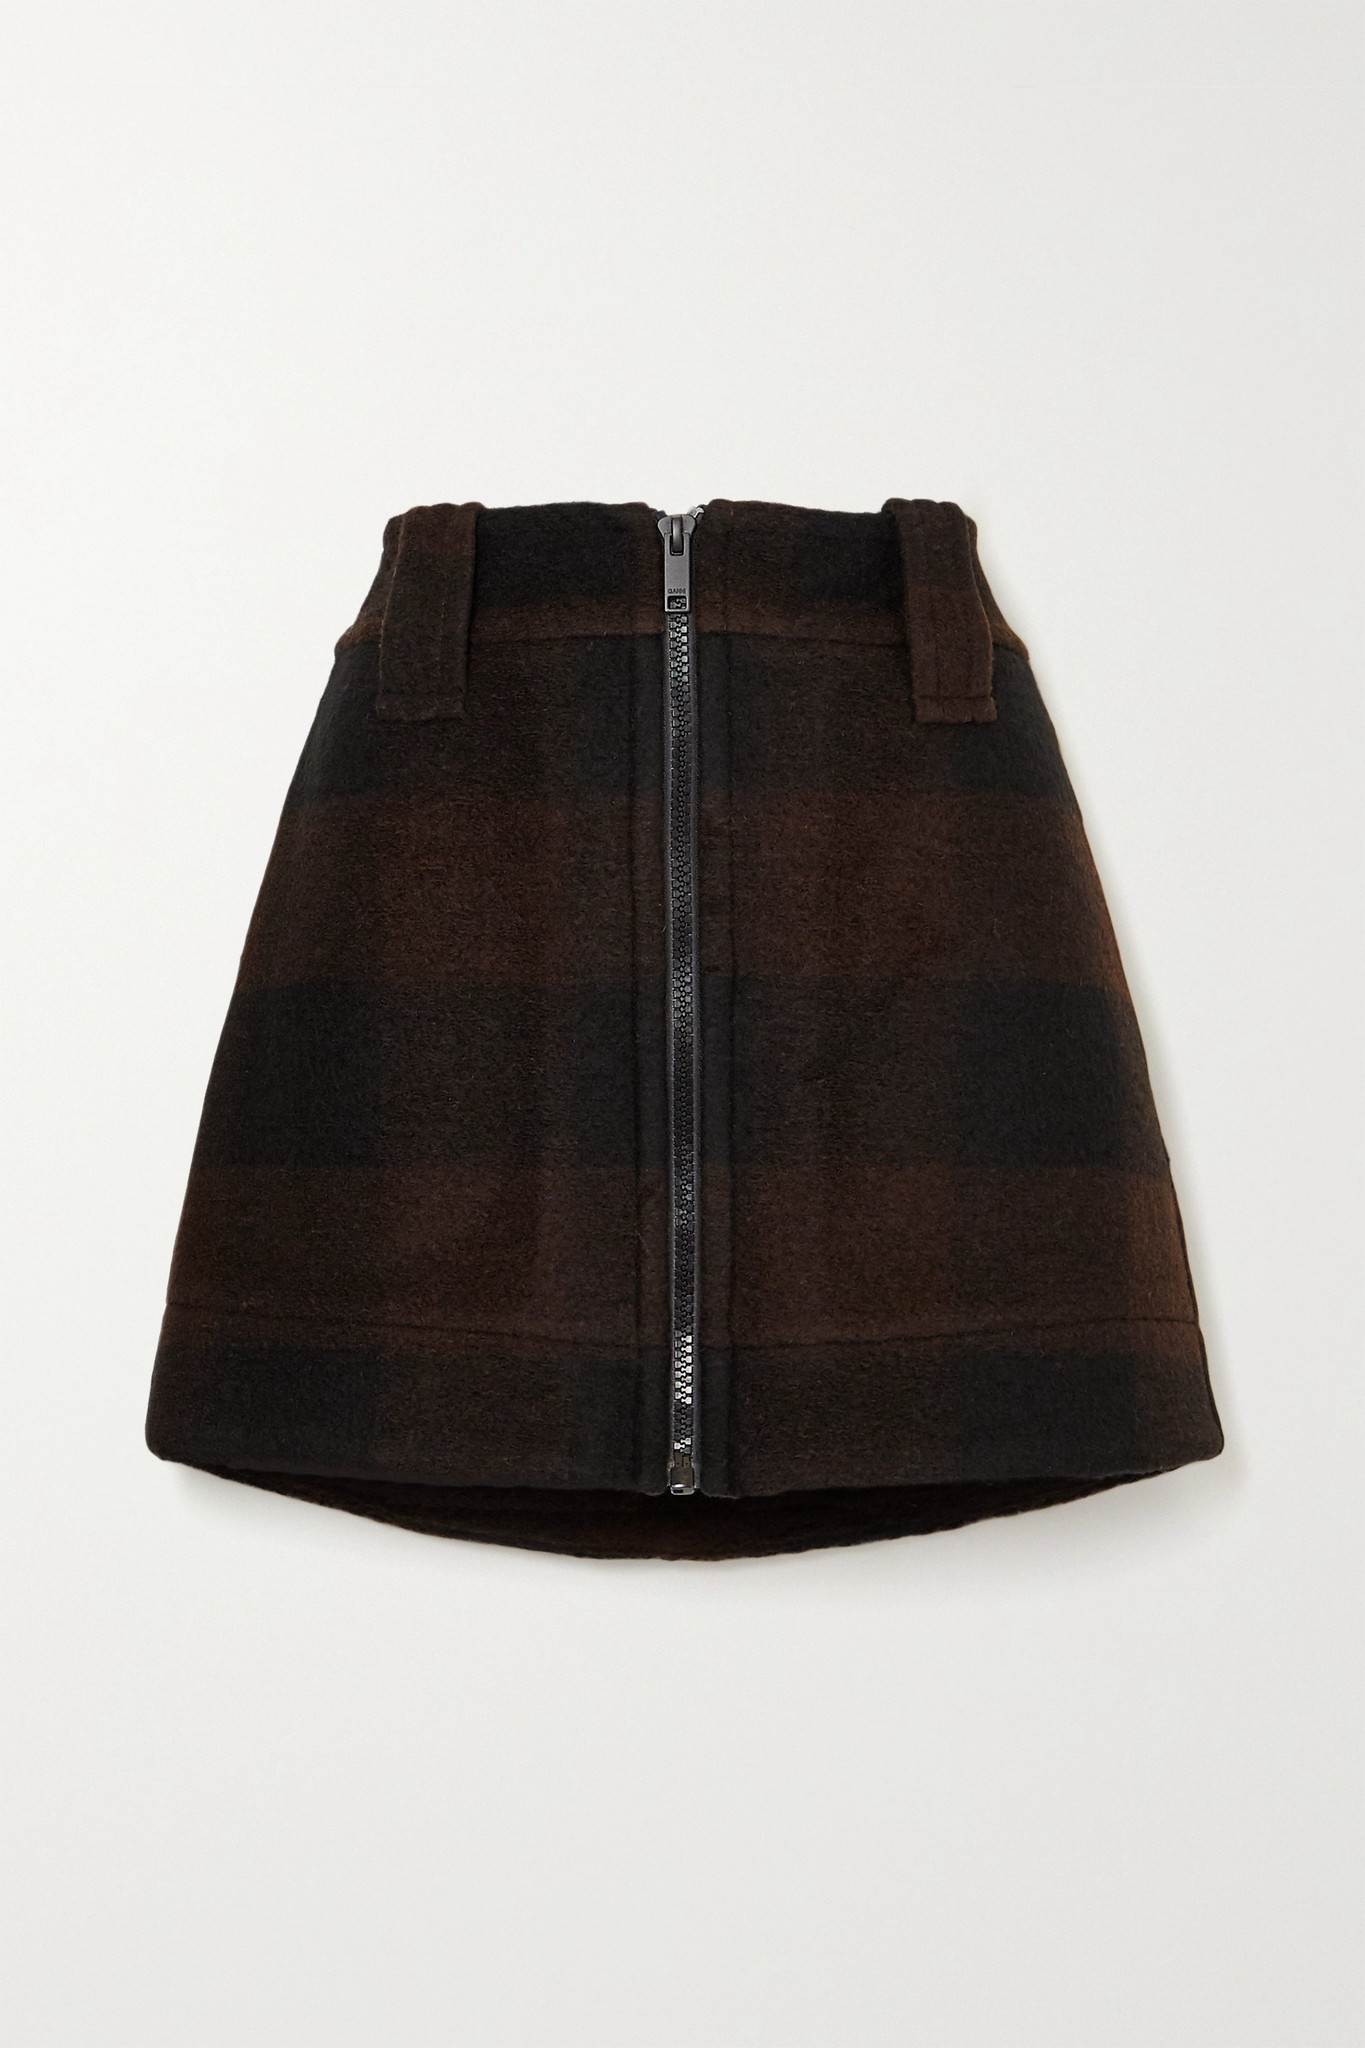 GANNI - Checked Wool-blend Mini Skirt - Black - DK36